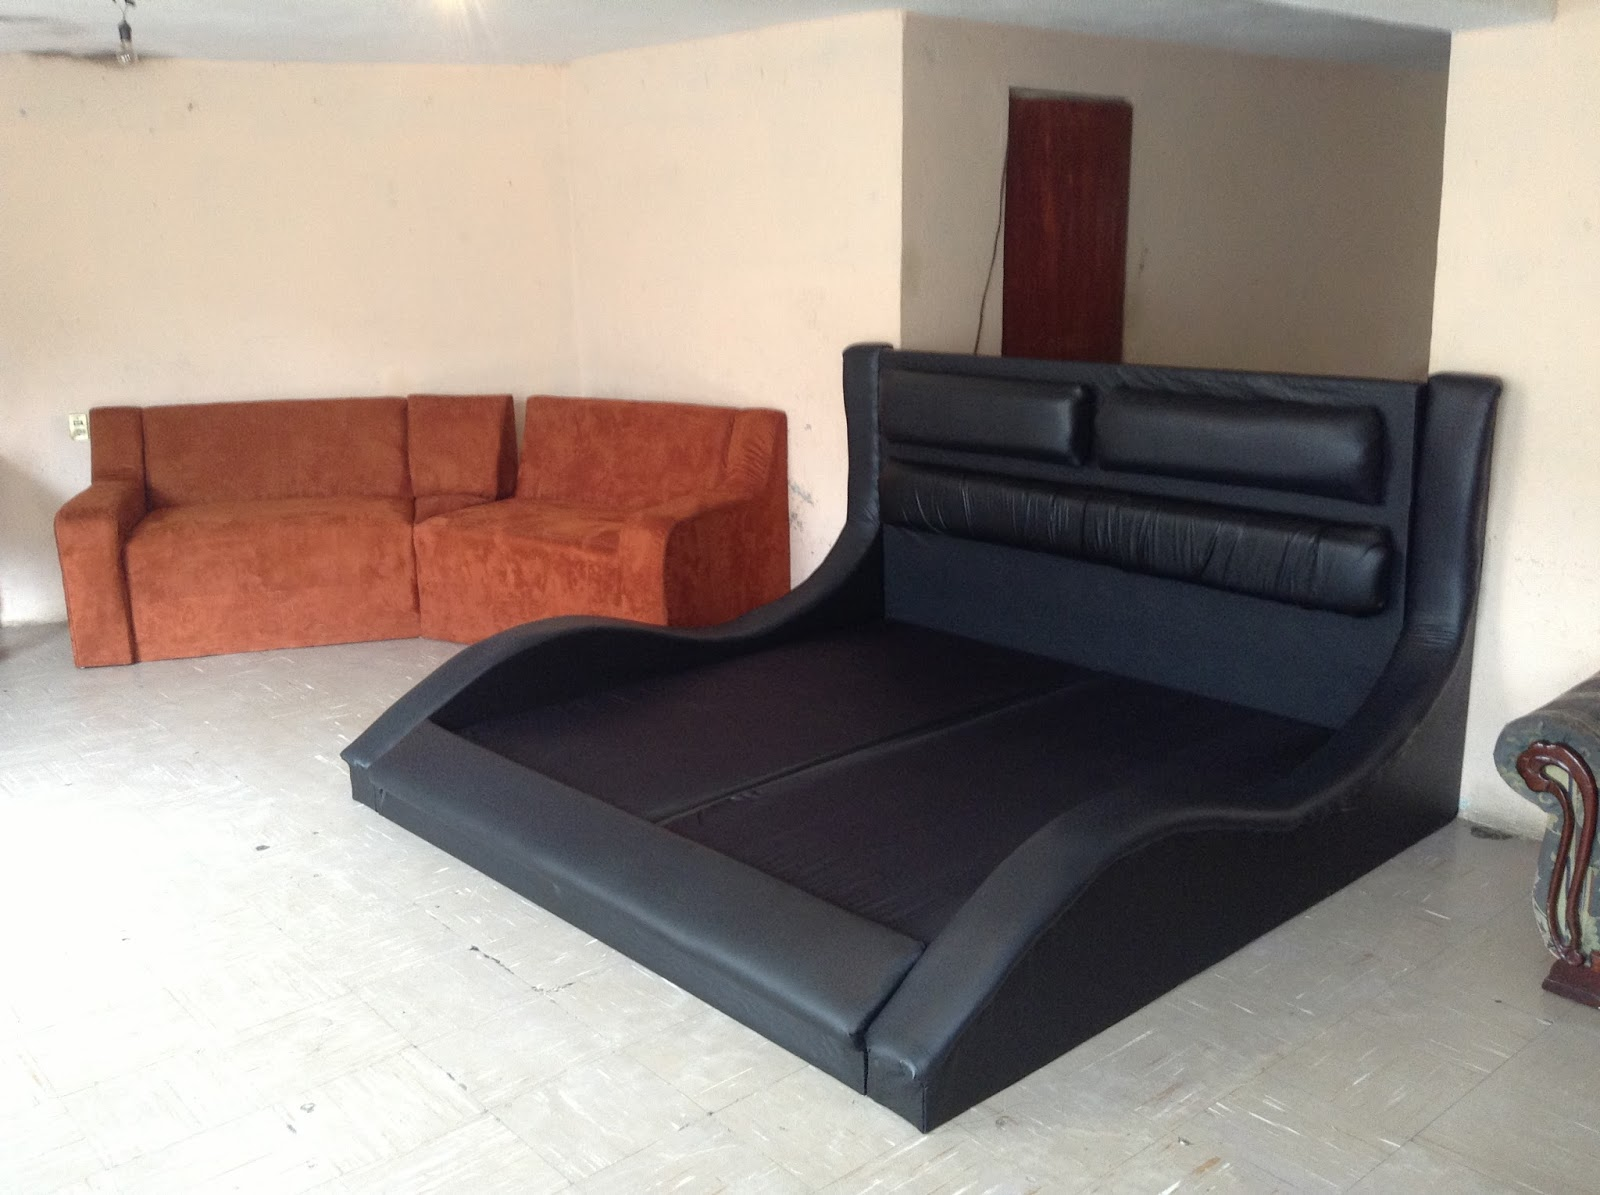 Recamaras muebles novostilo for Modelos de recamaras king size